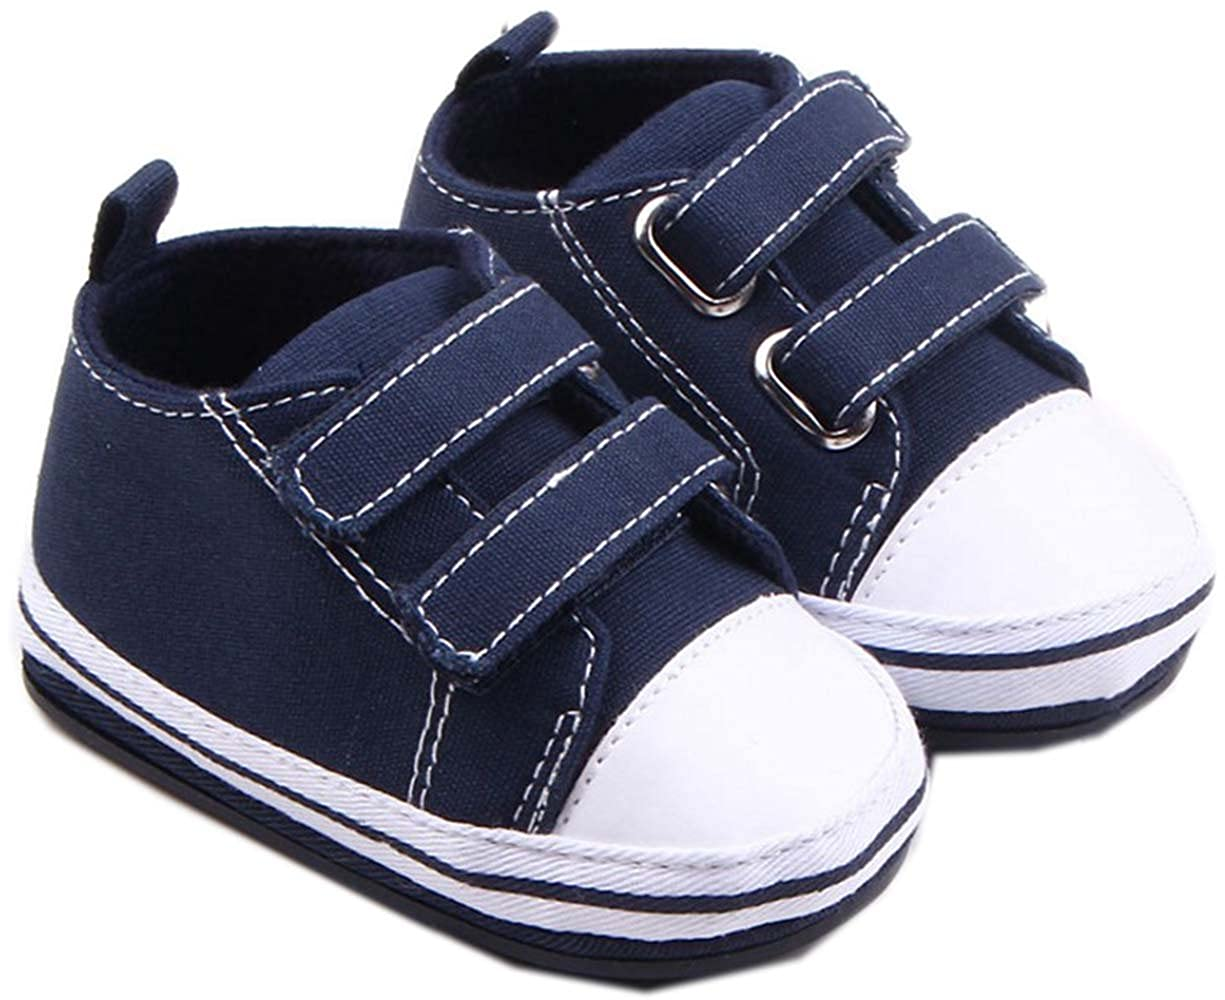 bettyhome Cotton Unisex Baby Newborn Navy Blue Canvas Soft Sole Infant Toddler Prewalker Sneakers 0-1 Year